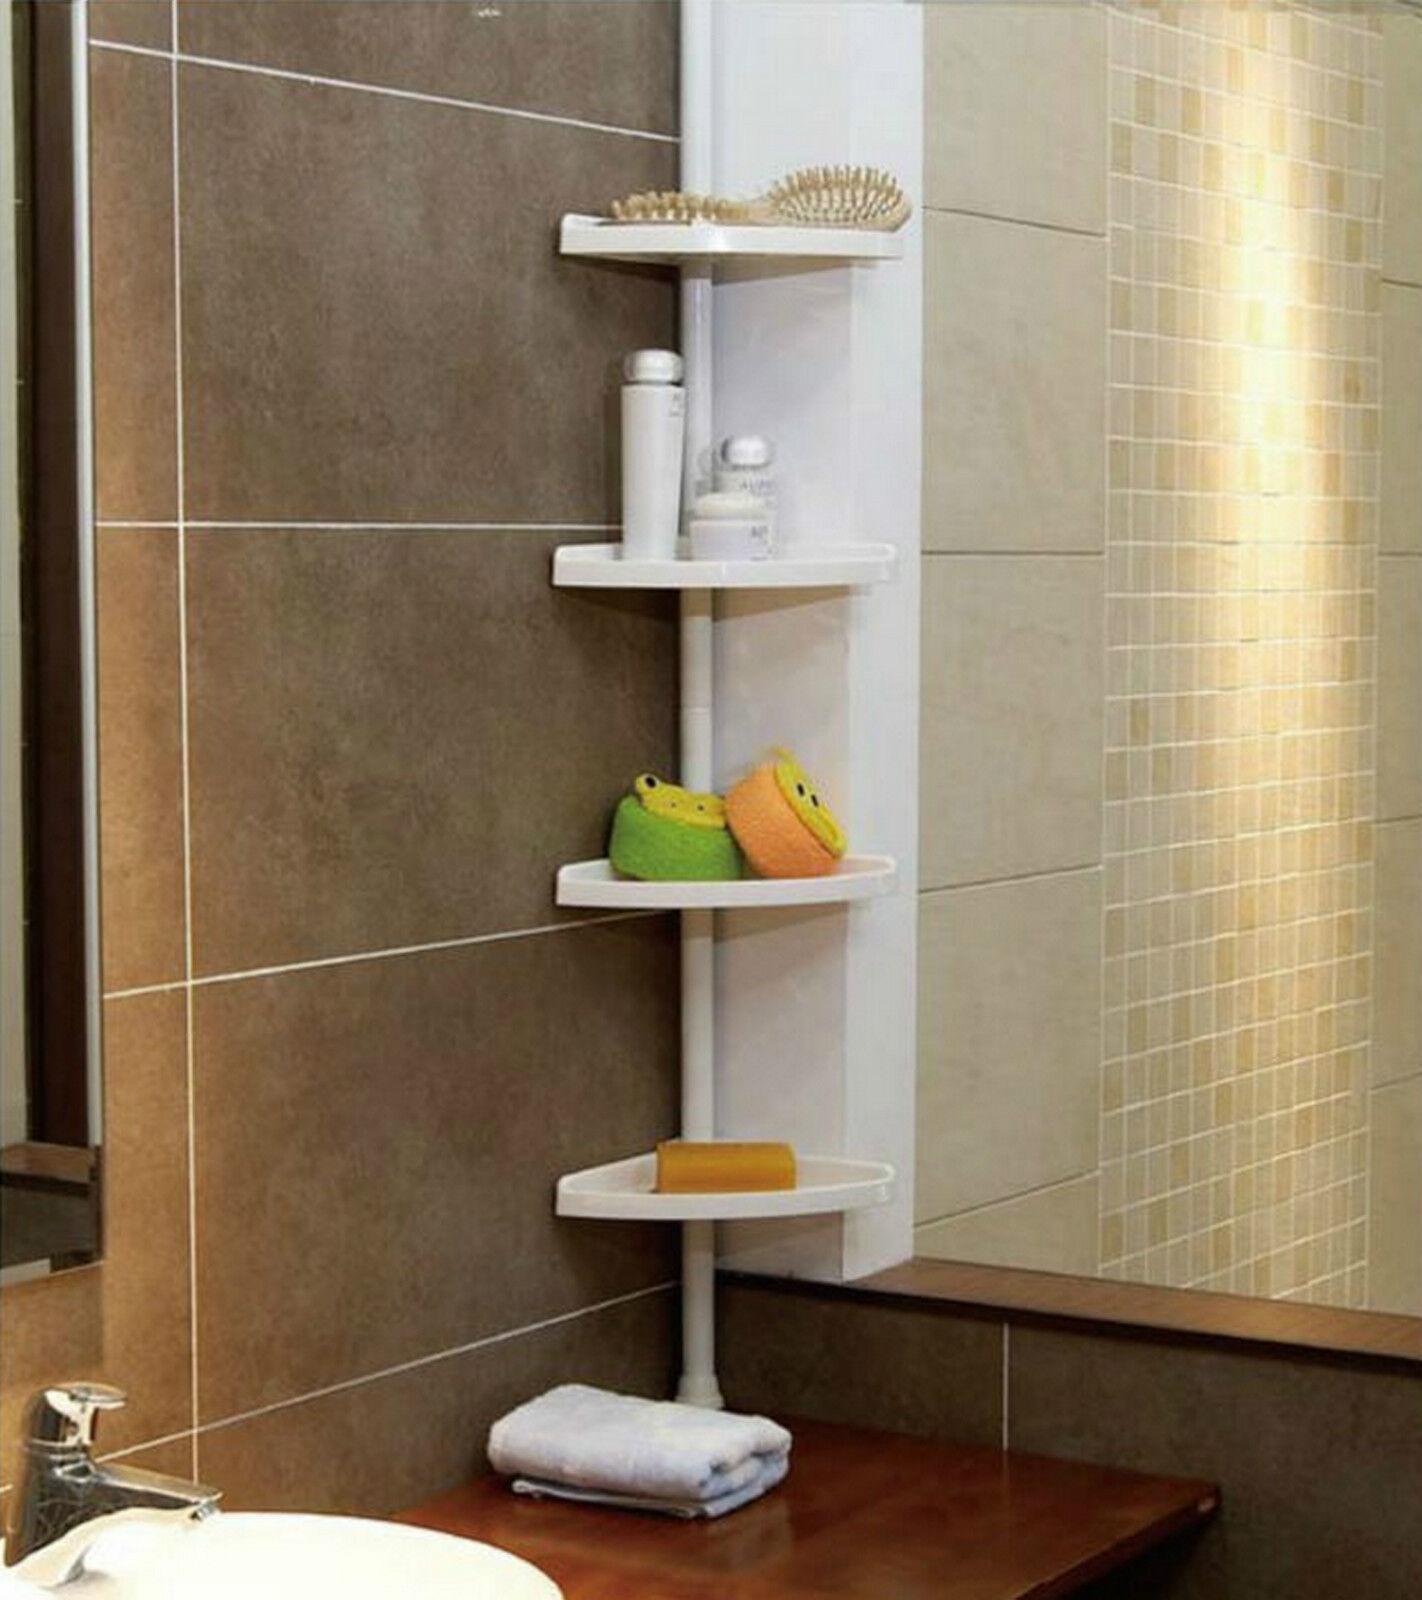 WHITE 4 Tier Adjustable Telescopic Corner Shower Bathroom ... on Bathroom Corner Shelf  id=86505